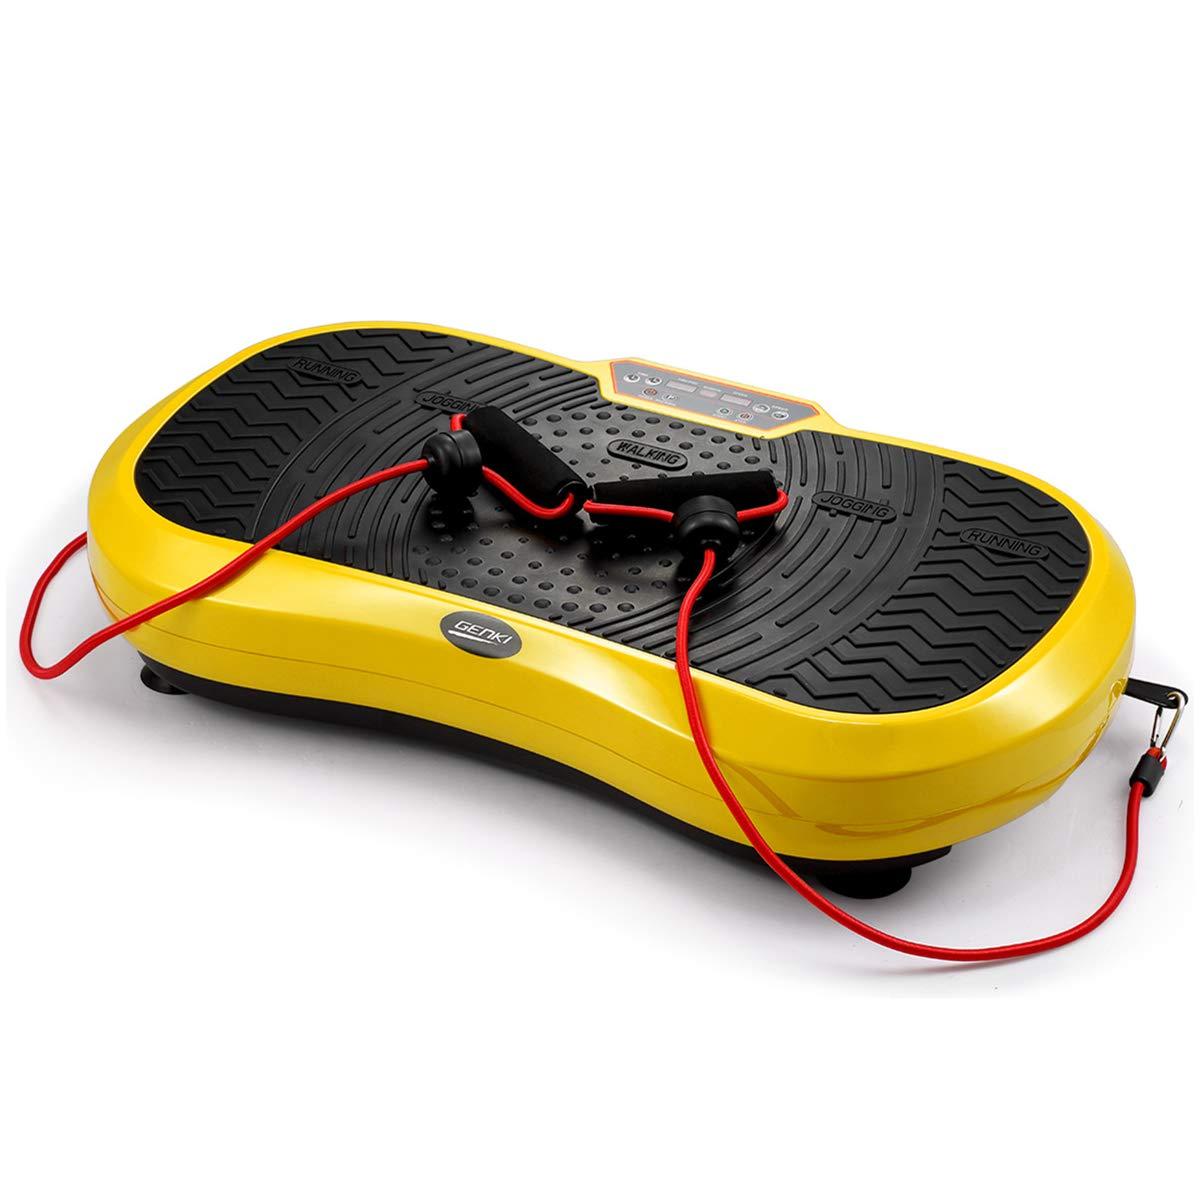 GENKI Fitness Vibration Platform Workout Machine Whole Full Body Shape Exercise Training Power Plate (Yellow)